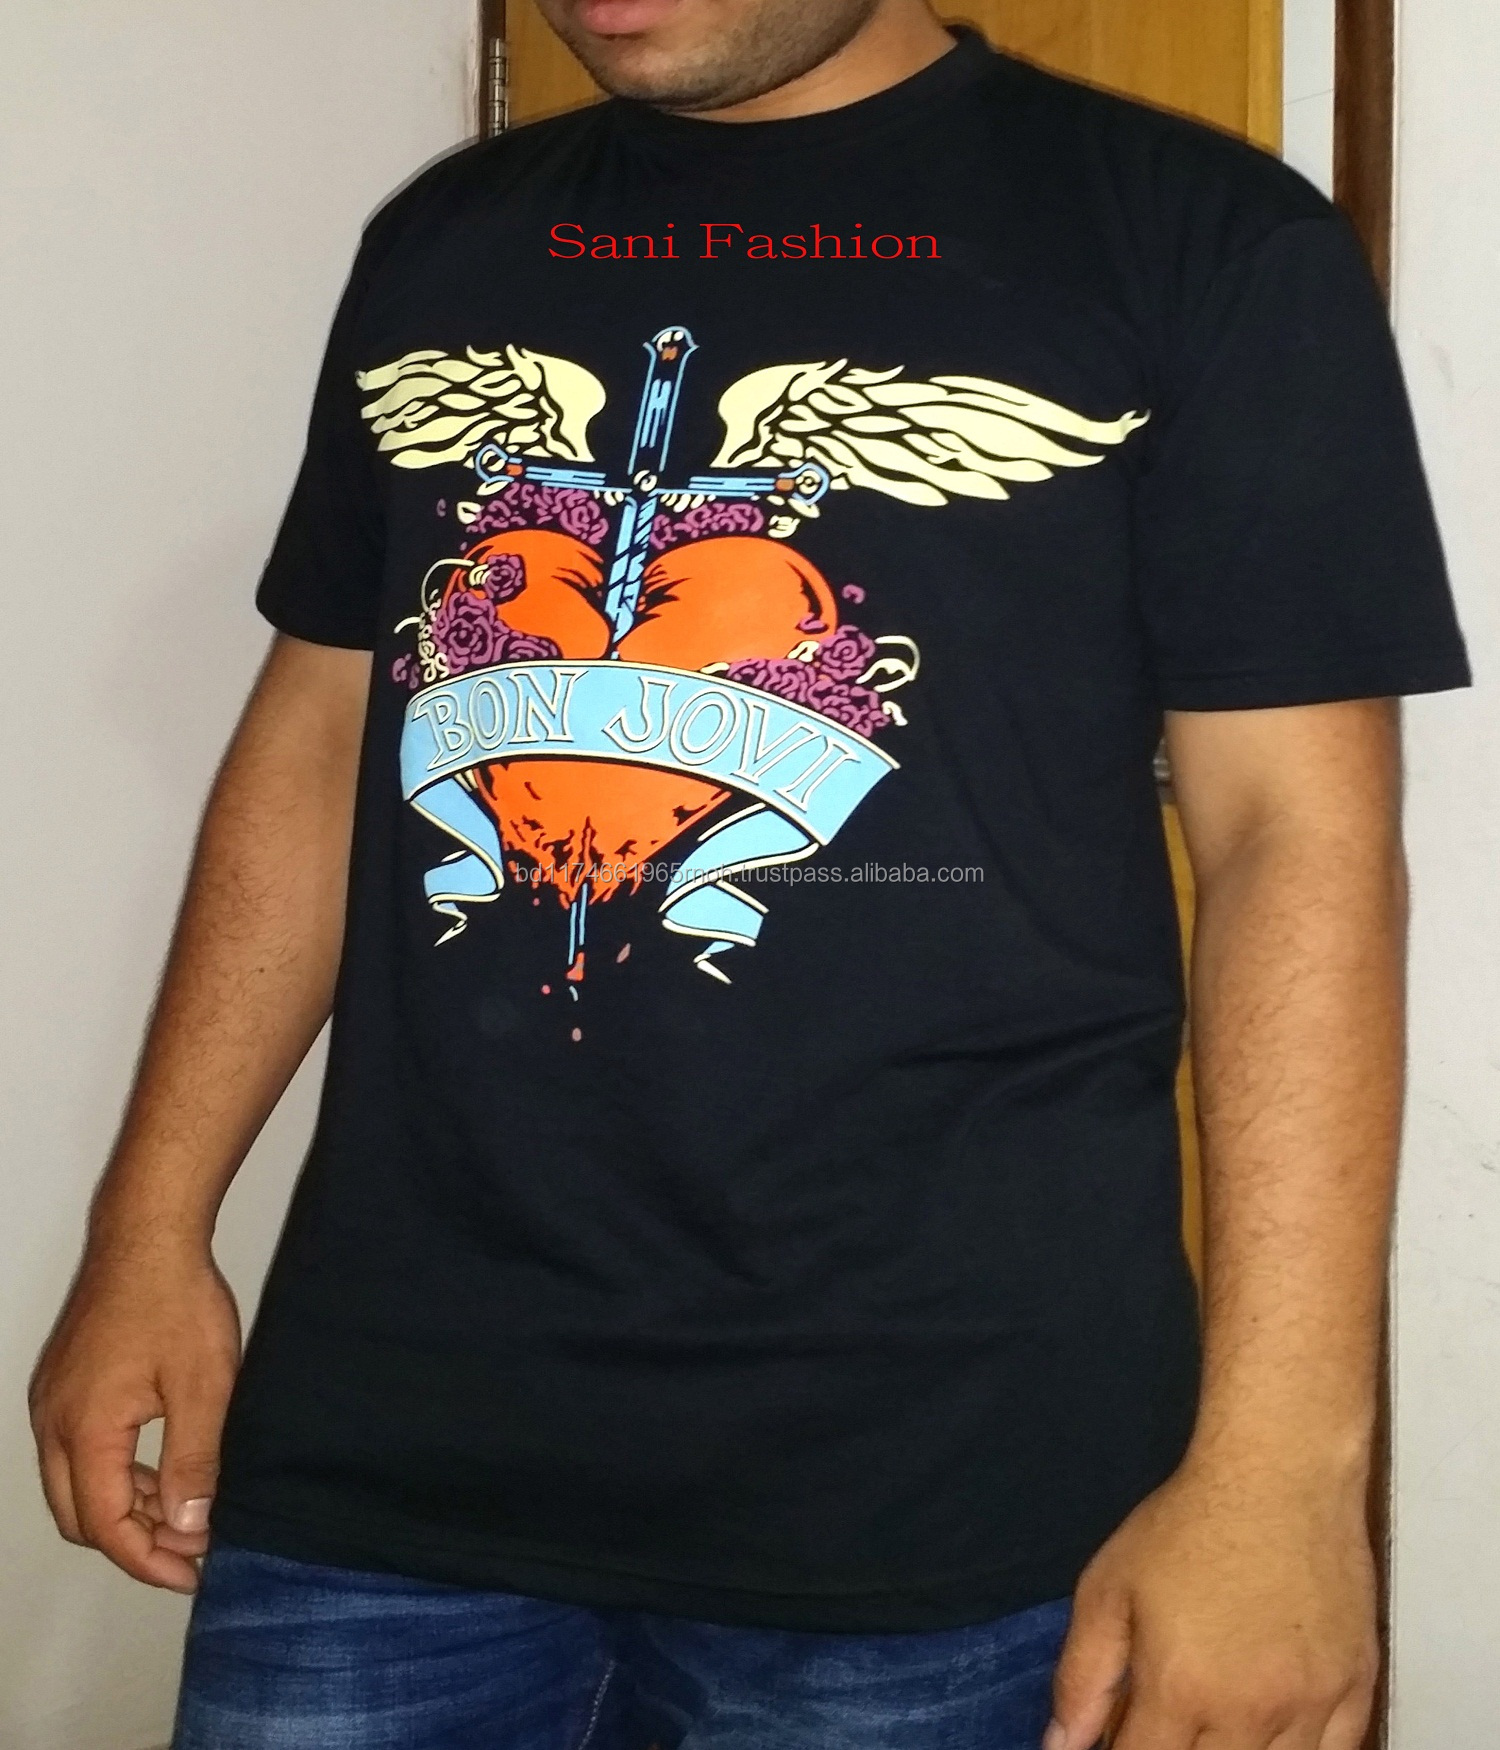 bd686d37e Custom T Shirt 100% Cotton Print Your Own Slimfit T Shirt For Men Stranger  Things Short Sleeves Customized Blouse Shirts